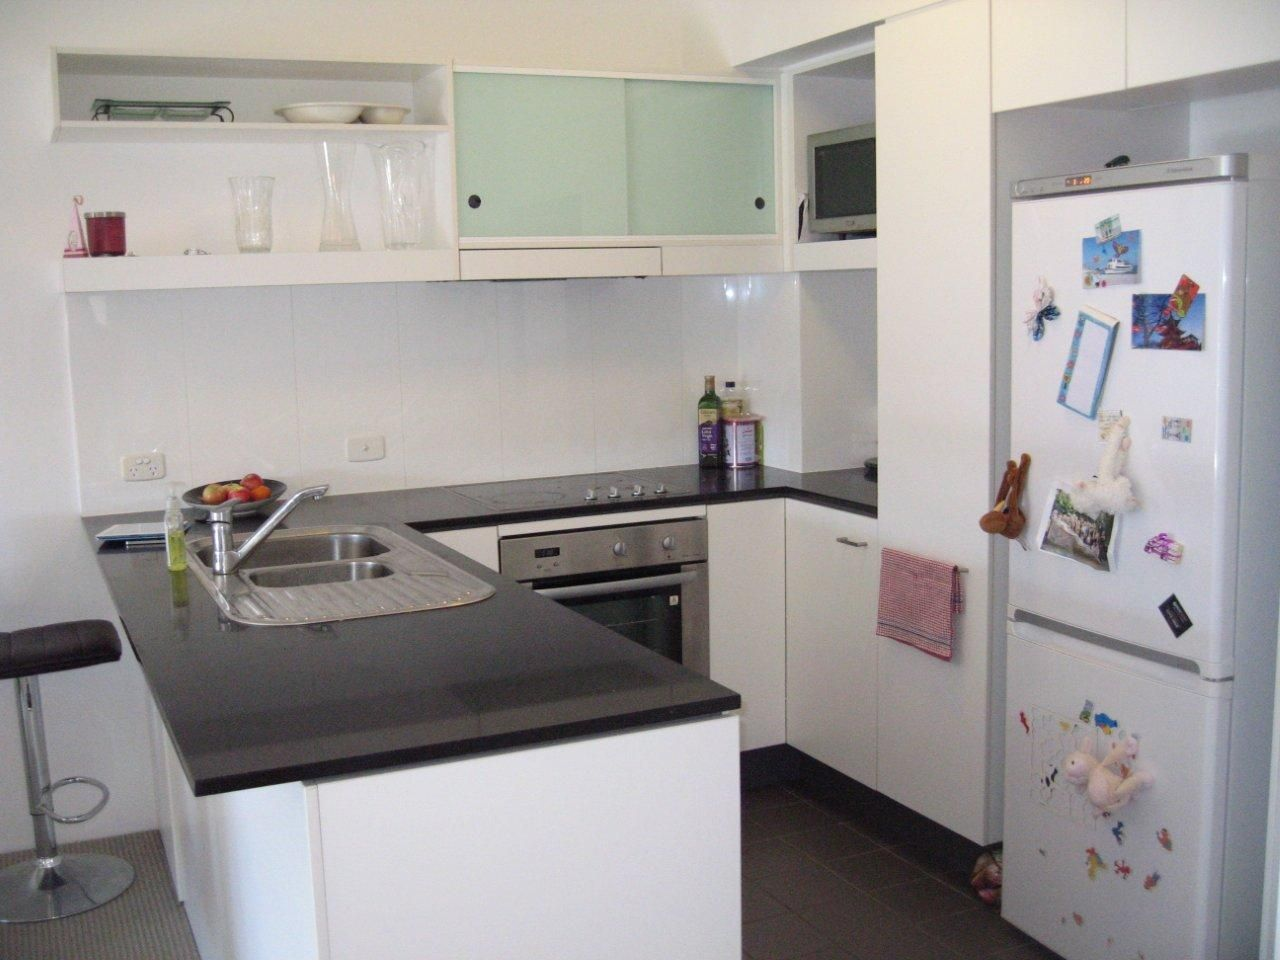 116/62 Cordelia, South Brisbane QLD 4101, Image 2